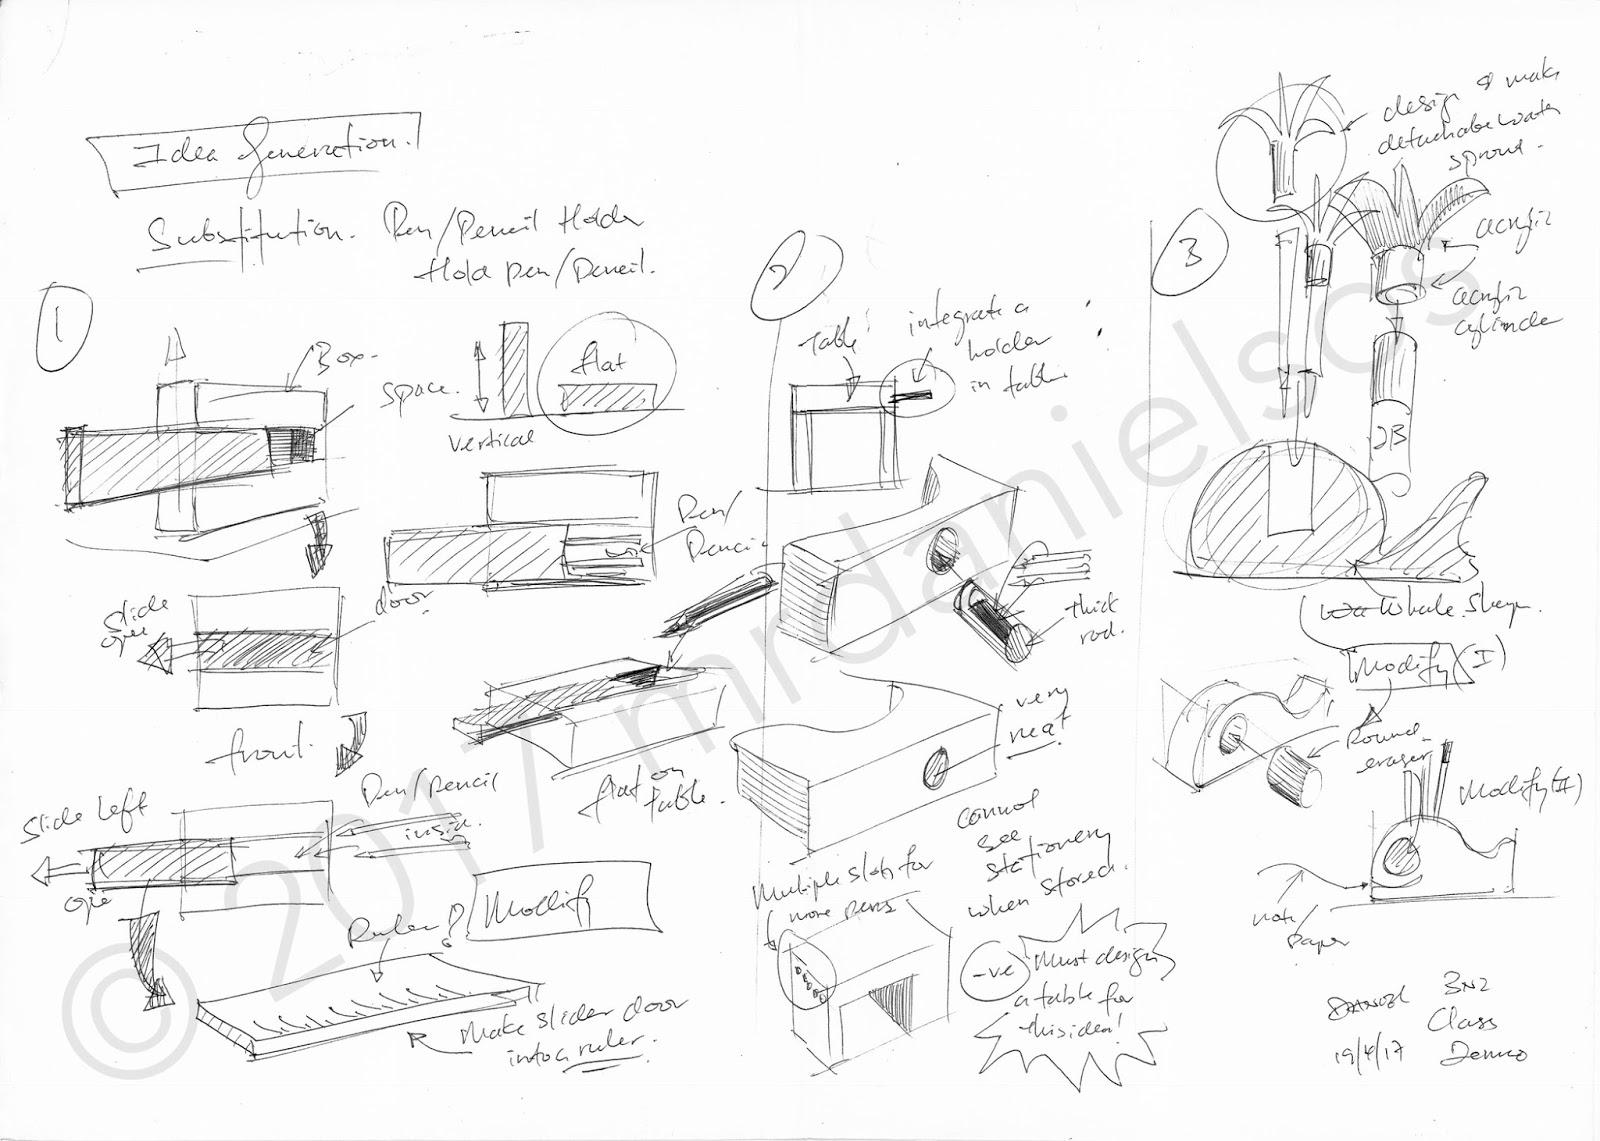 Design Journal Sos Pictorial Idea Generation And Development